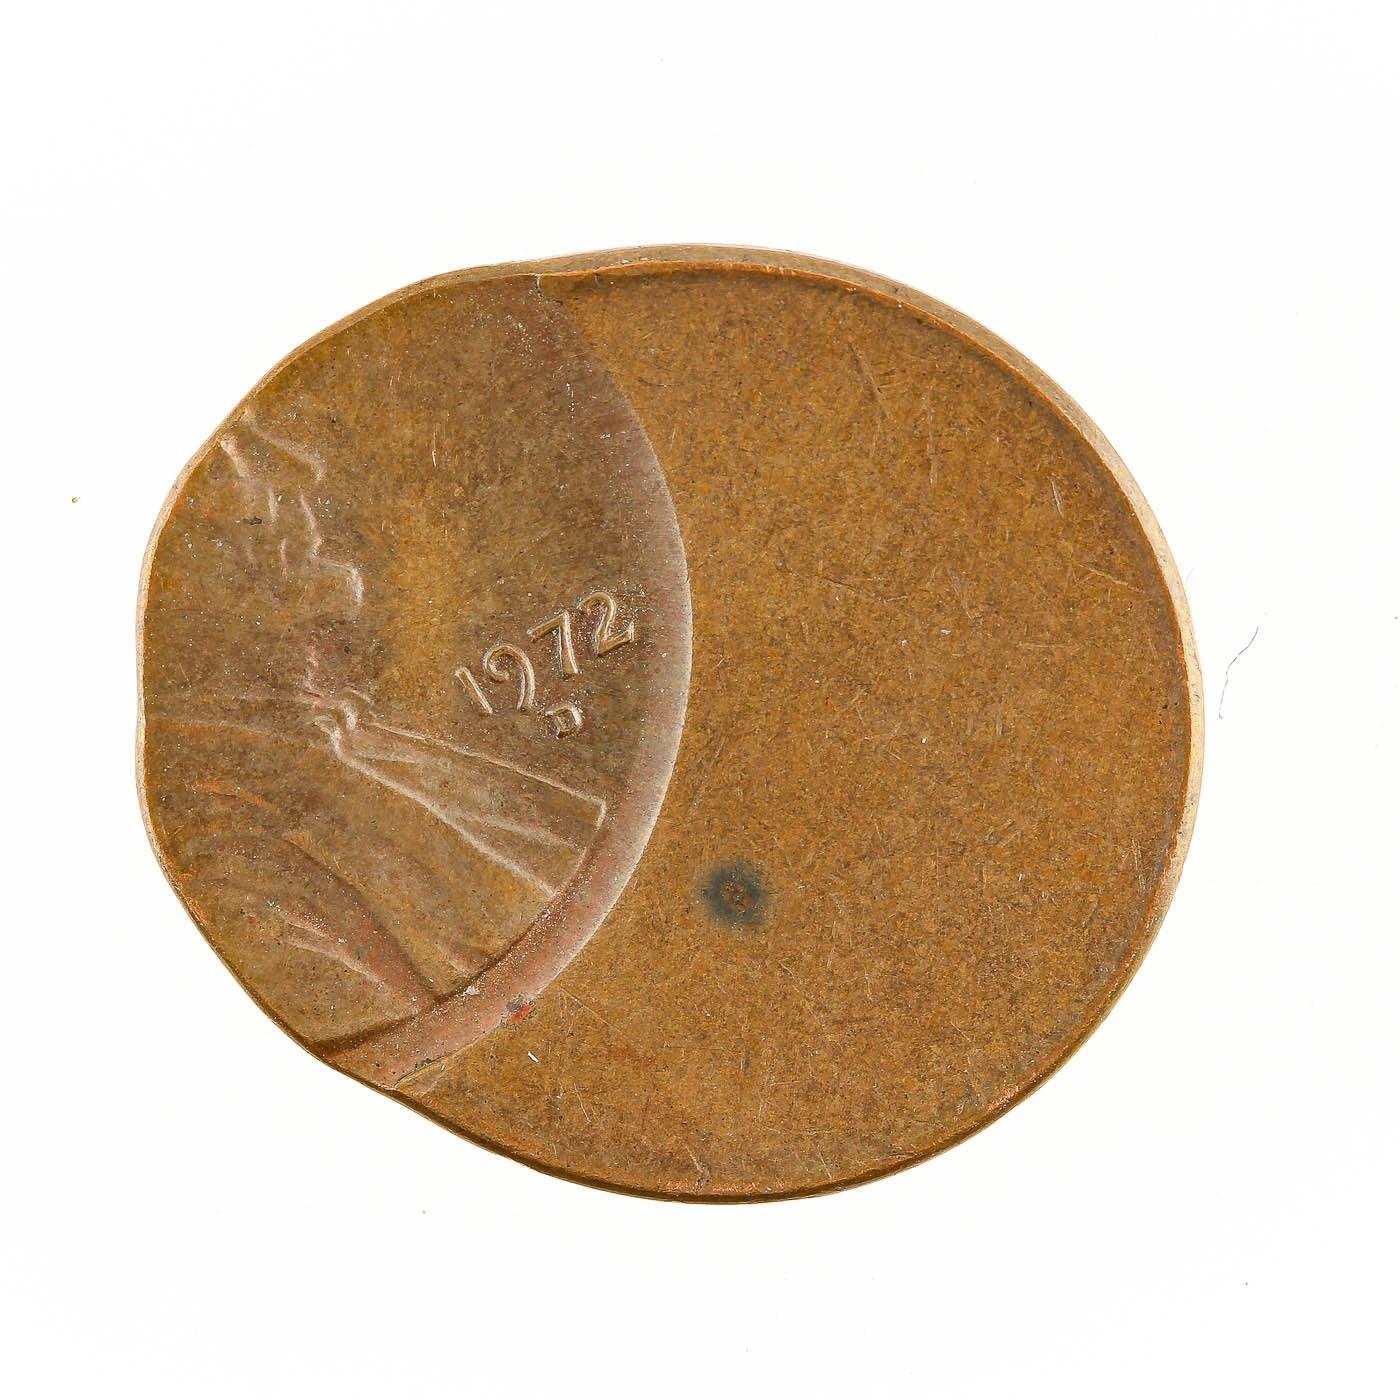 Off Center Mint Error 1972-D Lincoln Cent